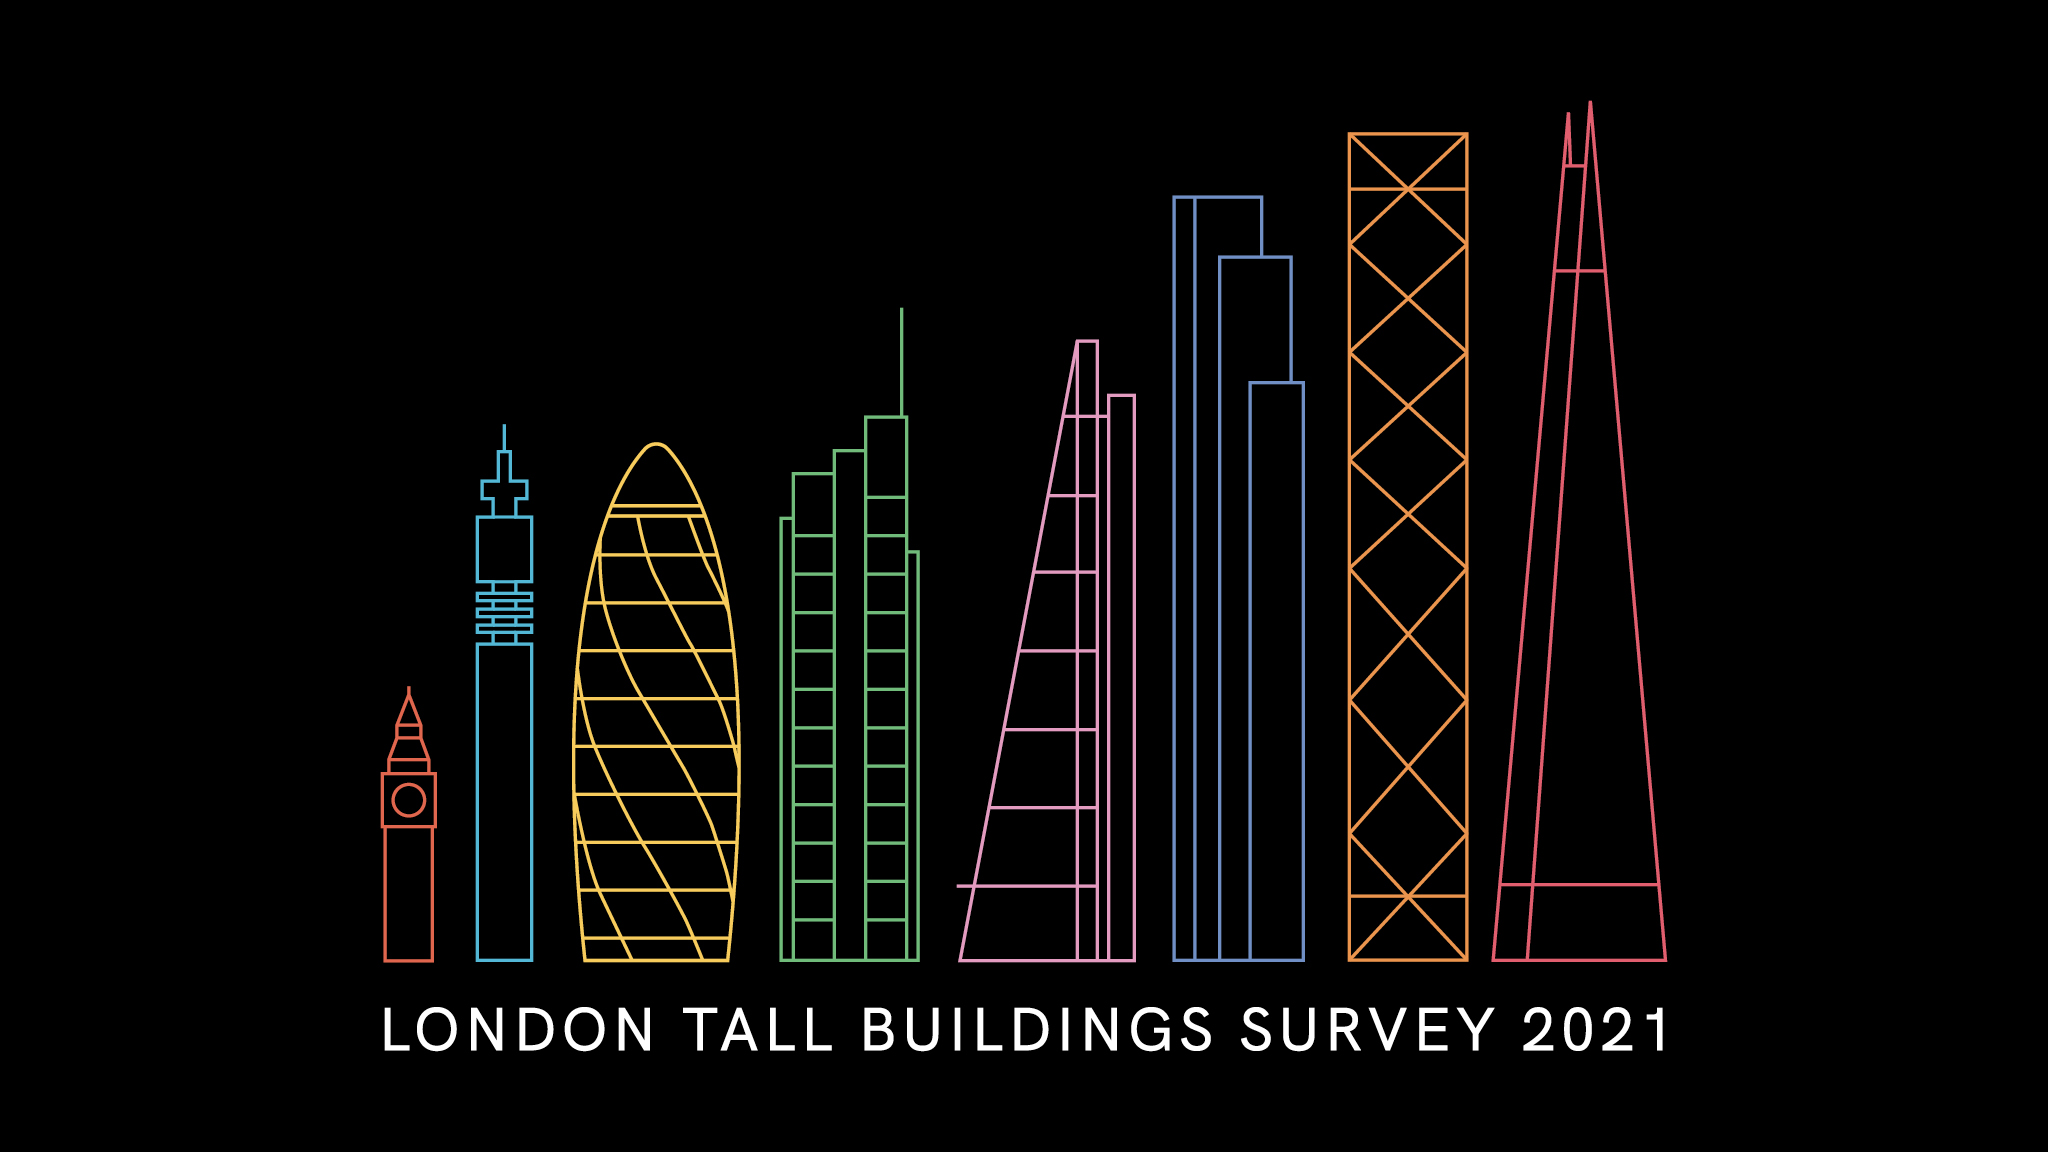 Londons Tall Buildings Survey 2021